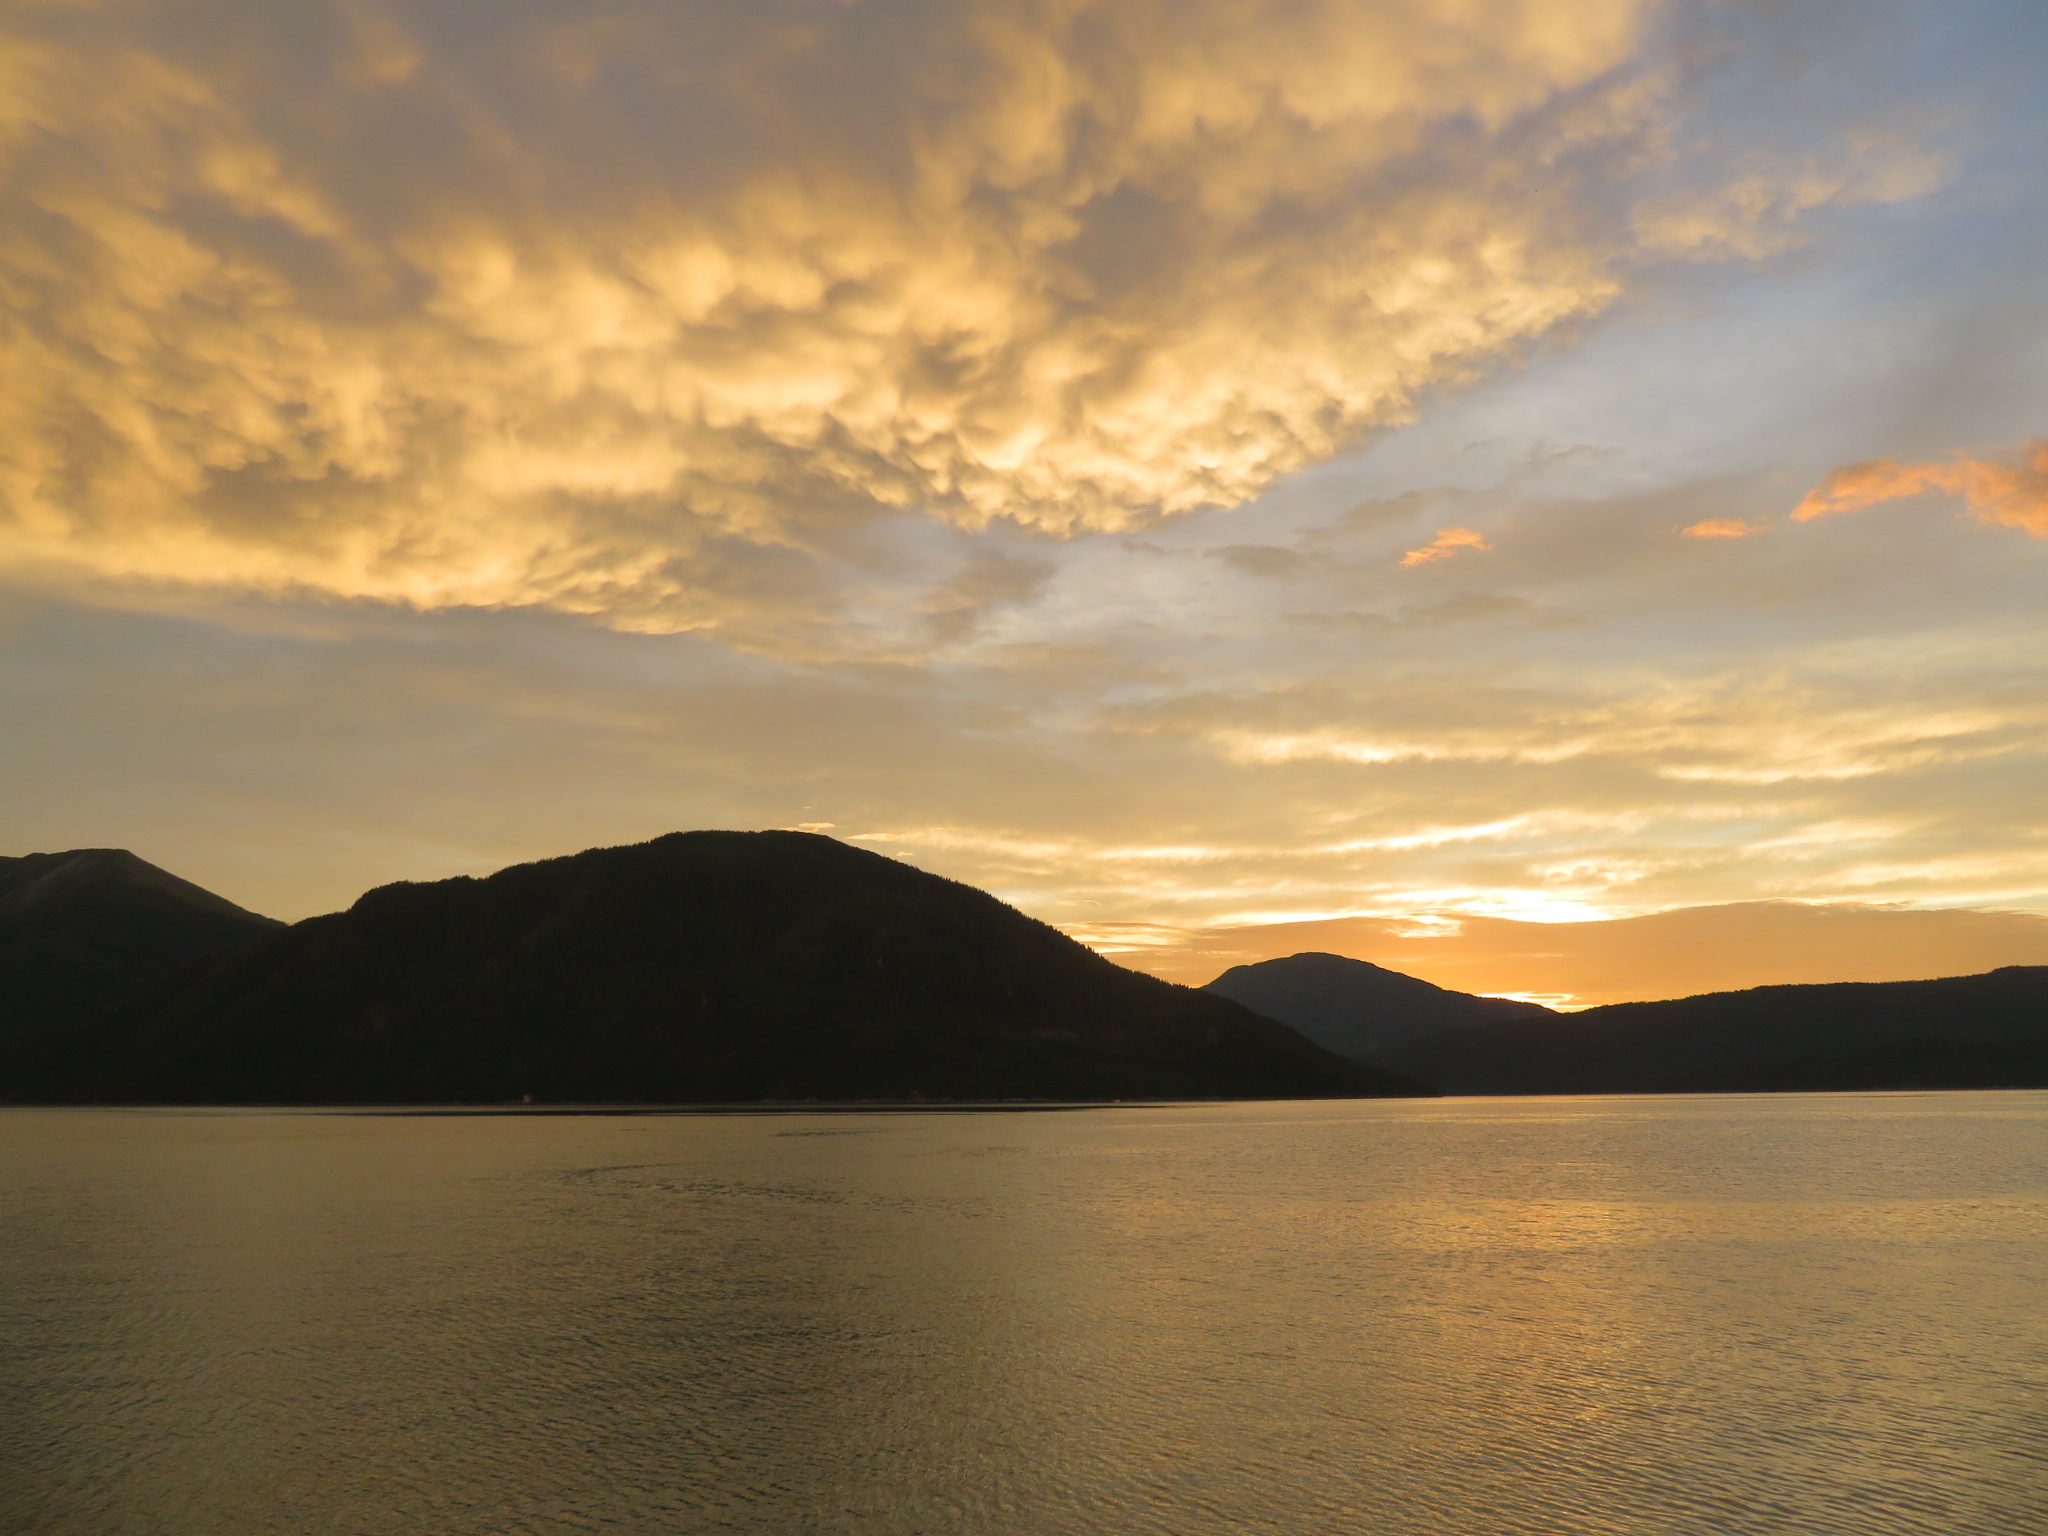 golden sunset across the channel above Loretta island